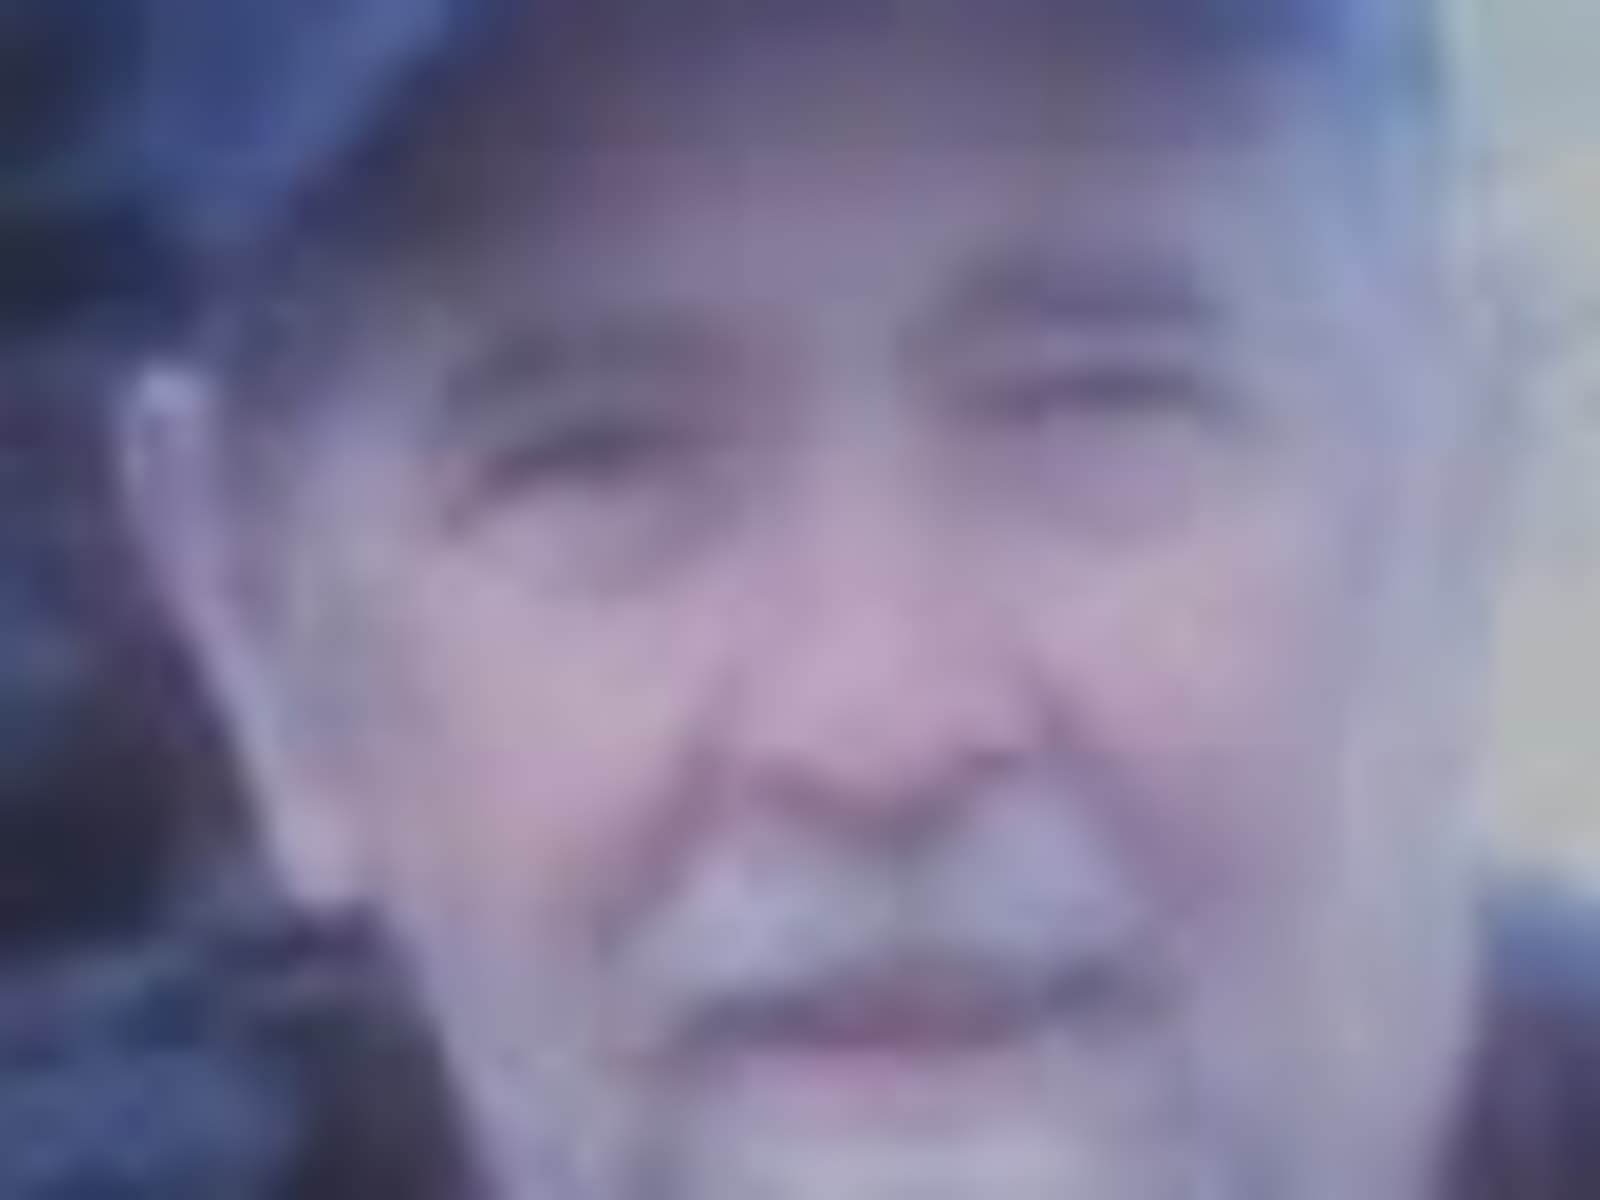 John d from Arlington, Washington, United States